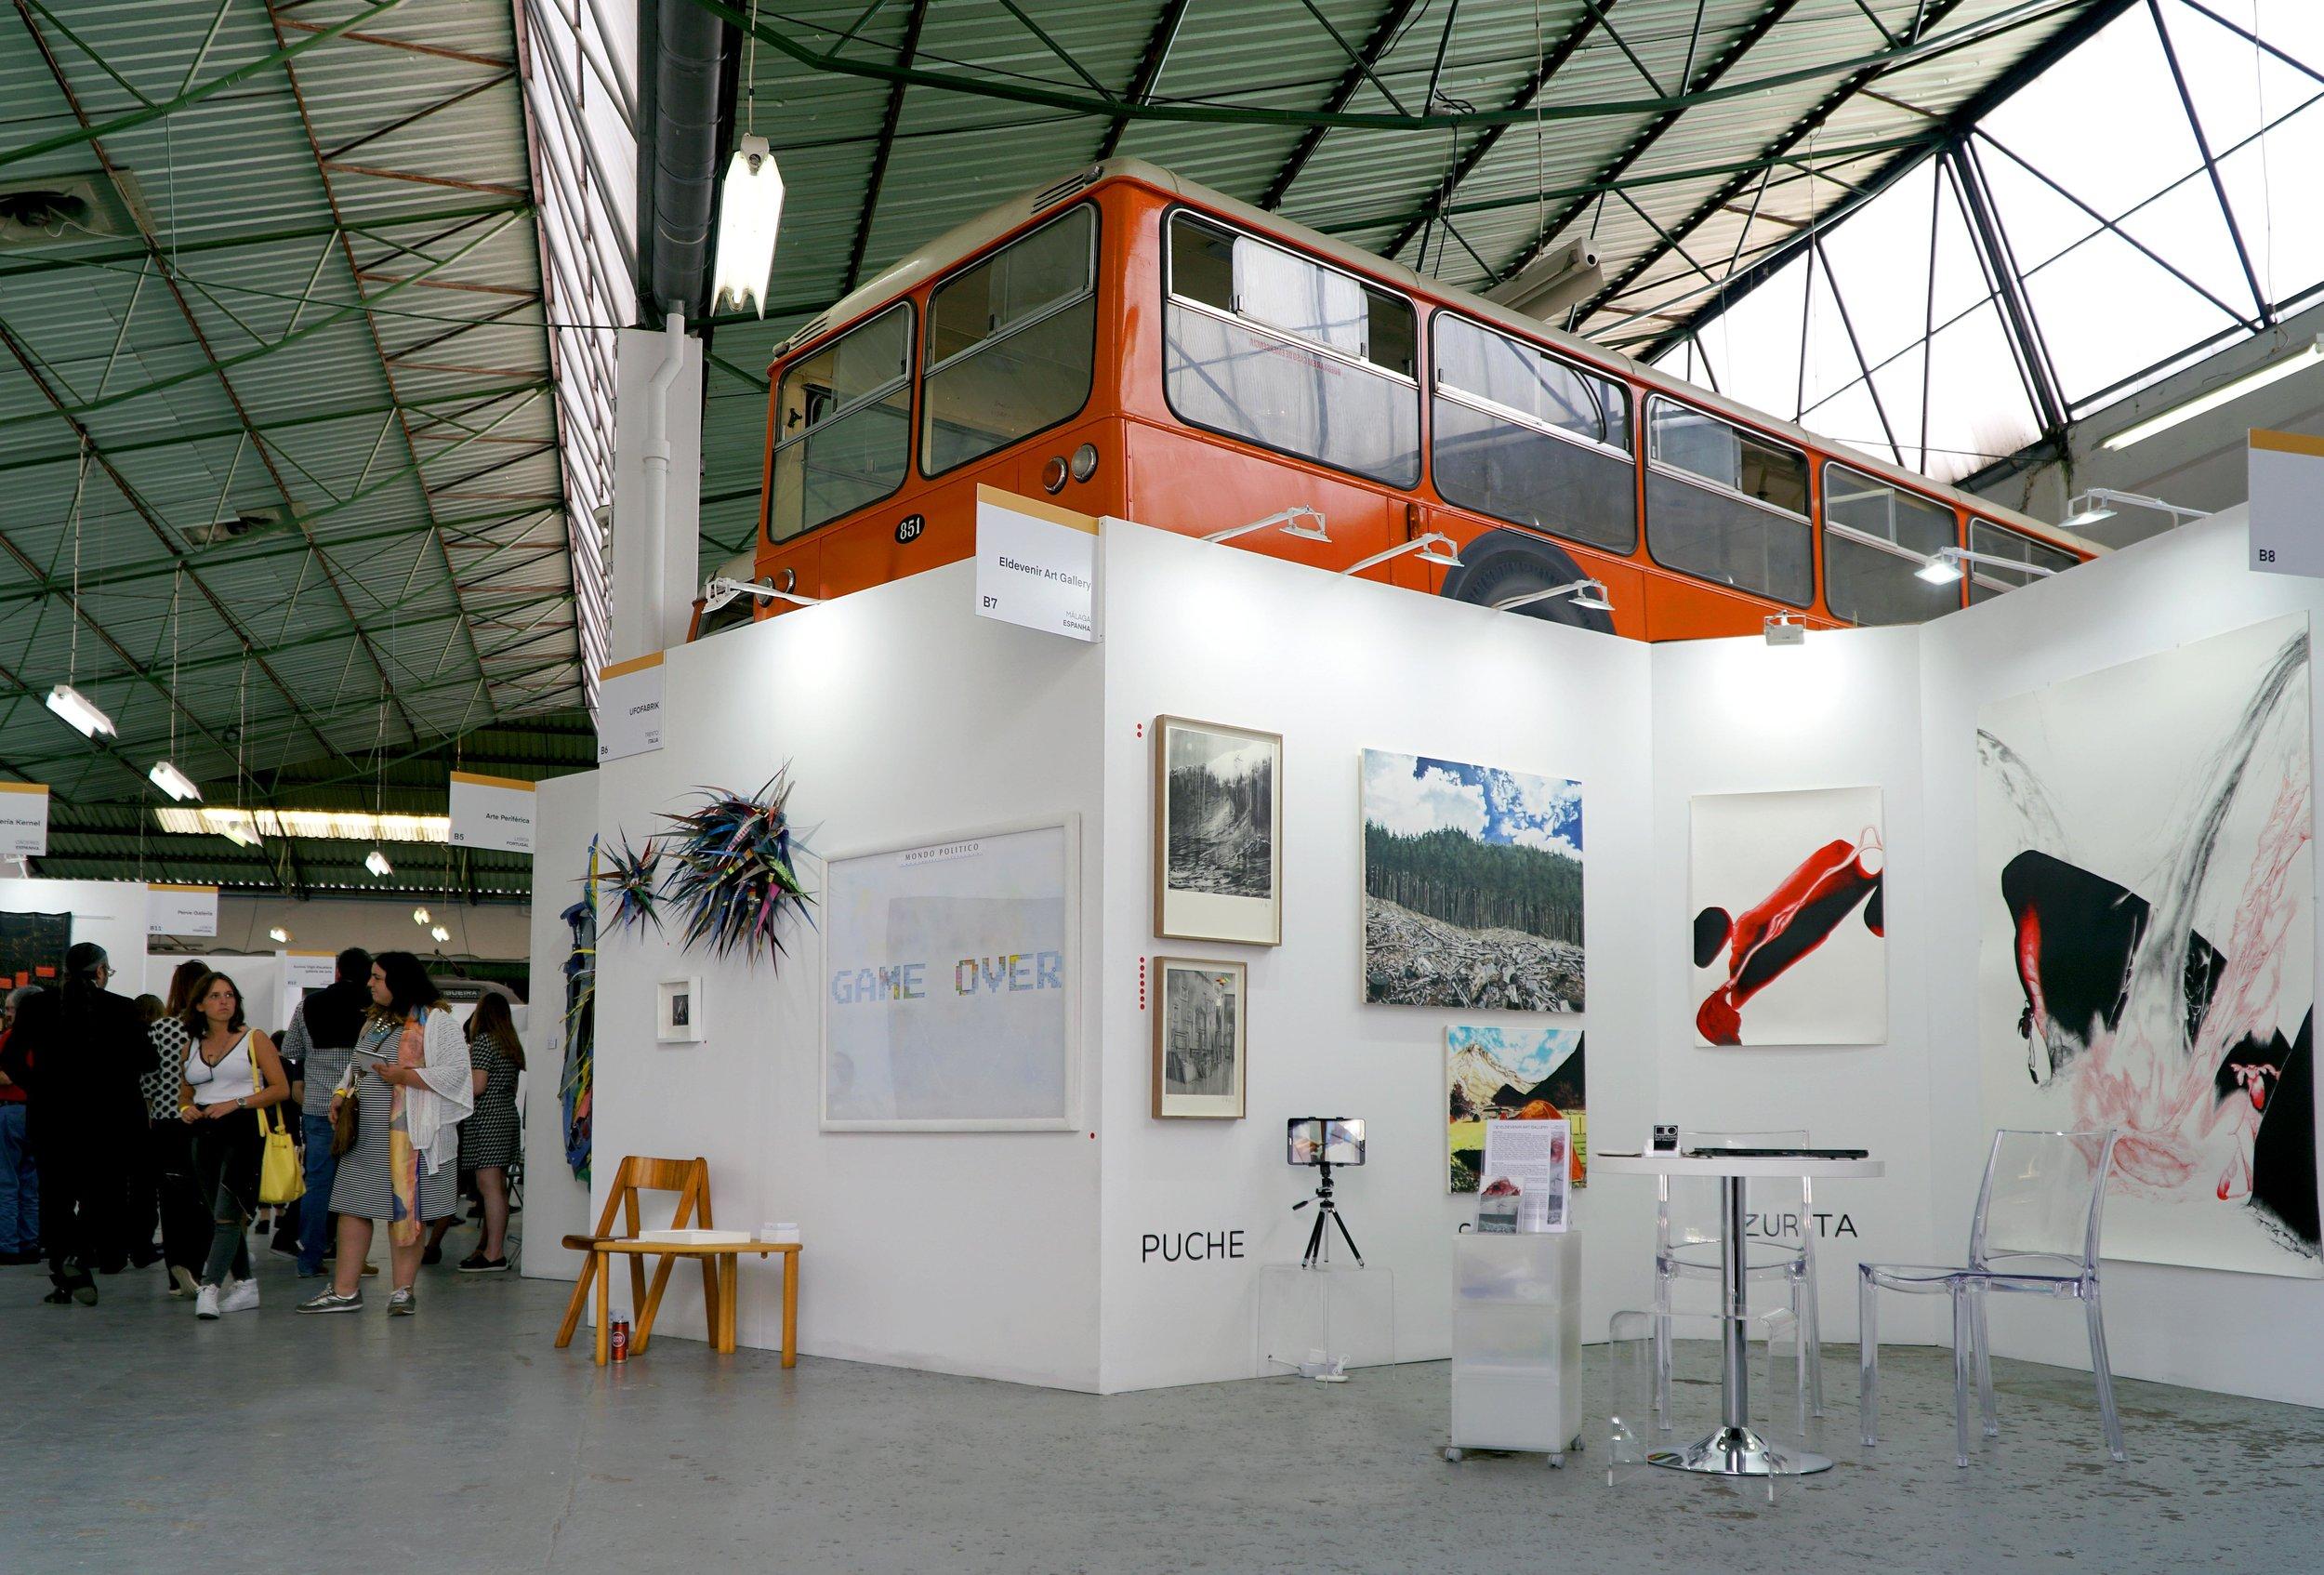 stand-justlx-lisboa-contermporary-art-fair-justmad-eldevenir-art-gallery-galeria-online.jpg